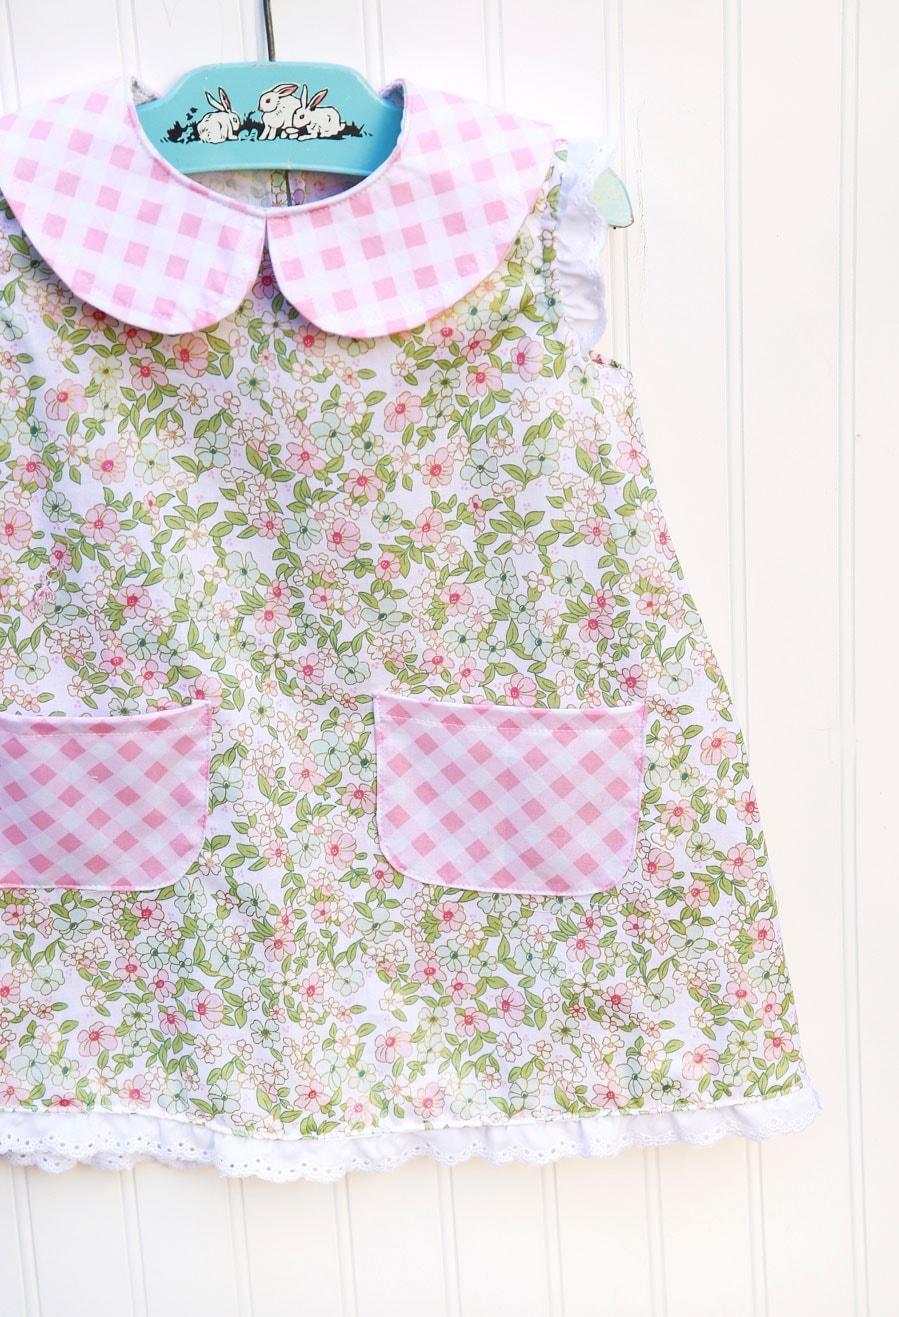 Wonderland Girls Dress made by Elea Lutz